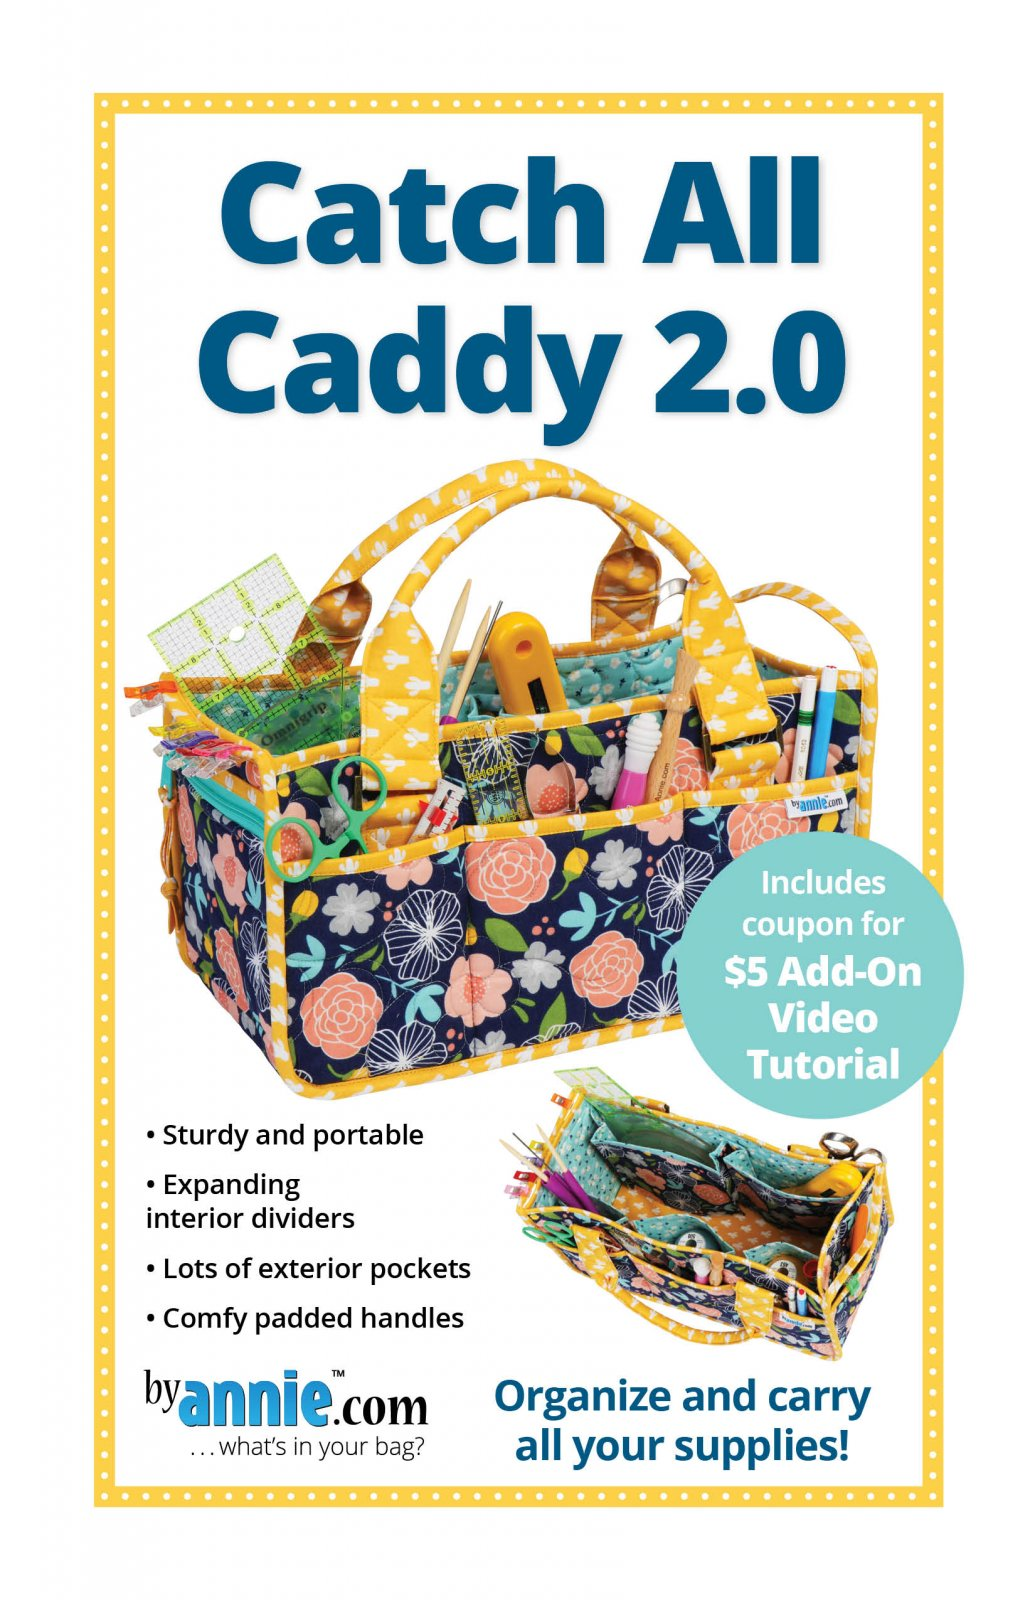 Catch All Caddy 2.0